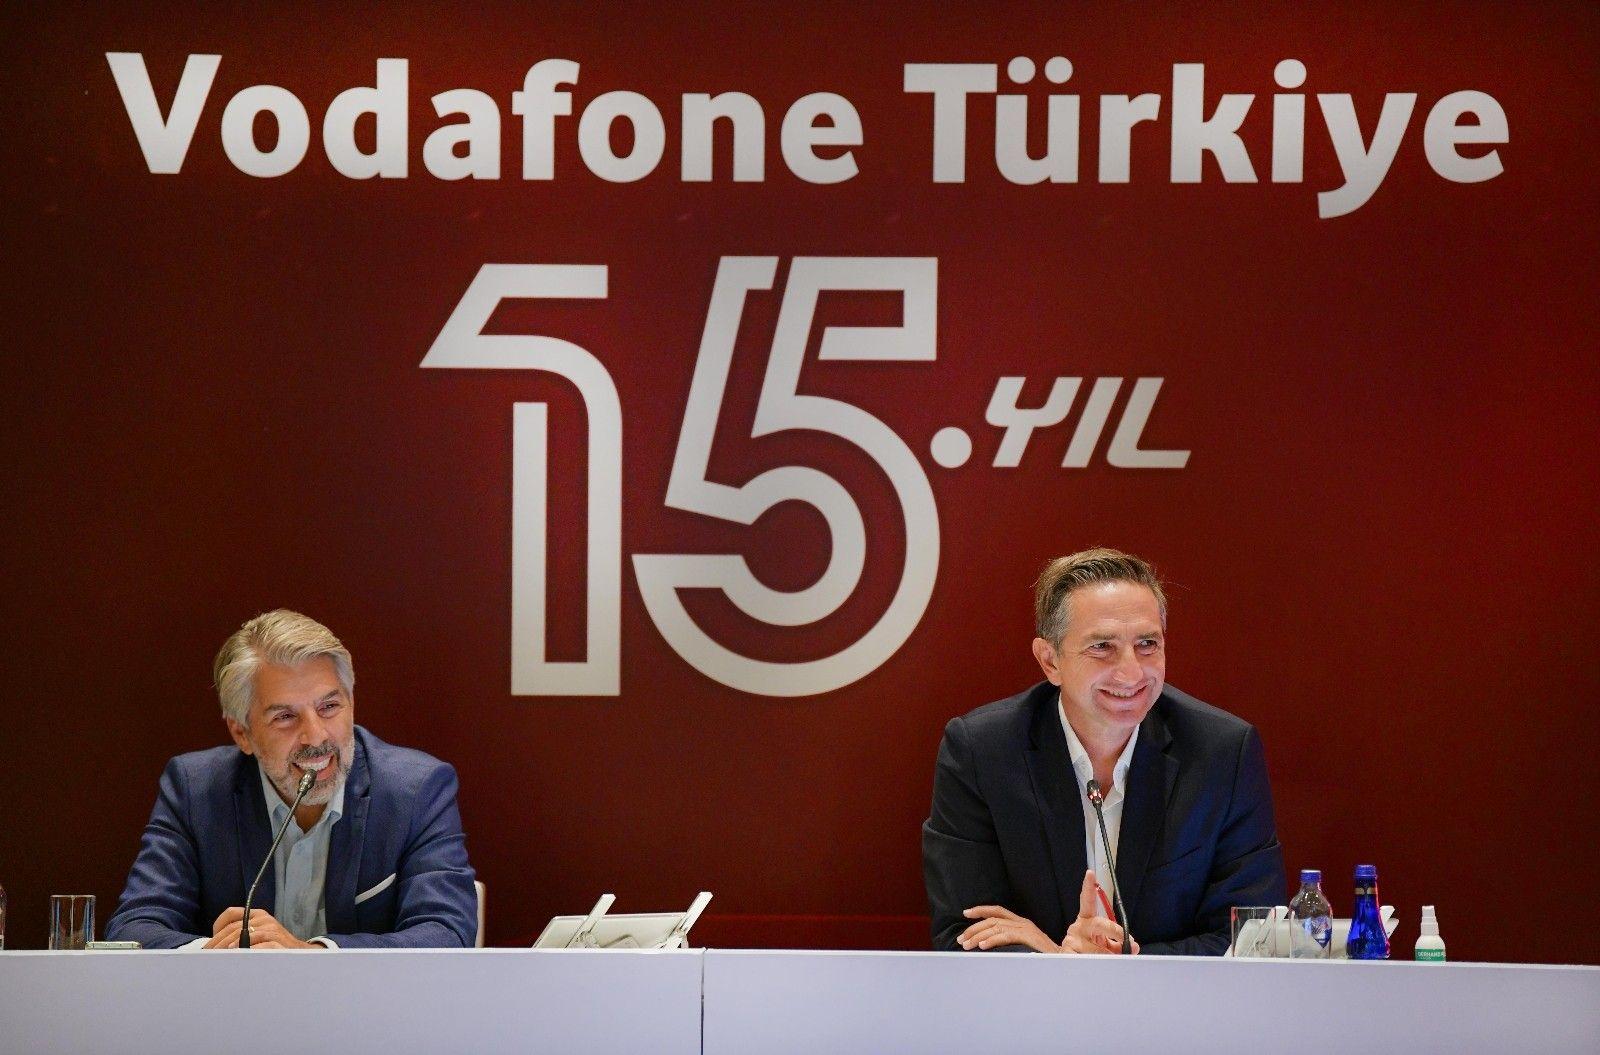 2021/09/buyuyen-turkiyenin-operatoru-olmaya-odaklandi-20210917AW41-2.jpg